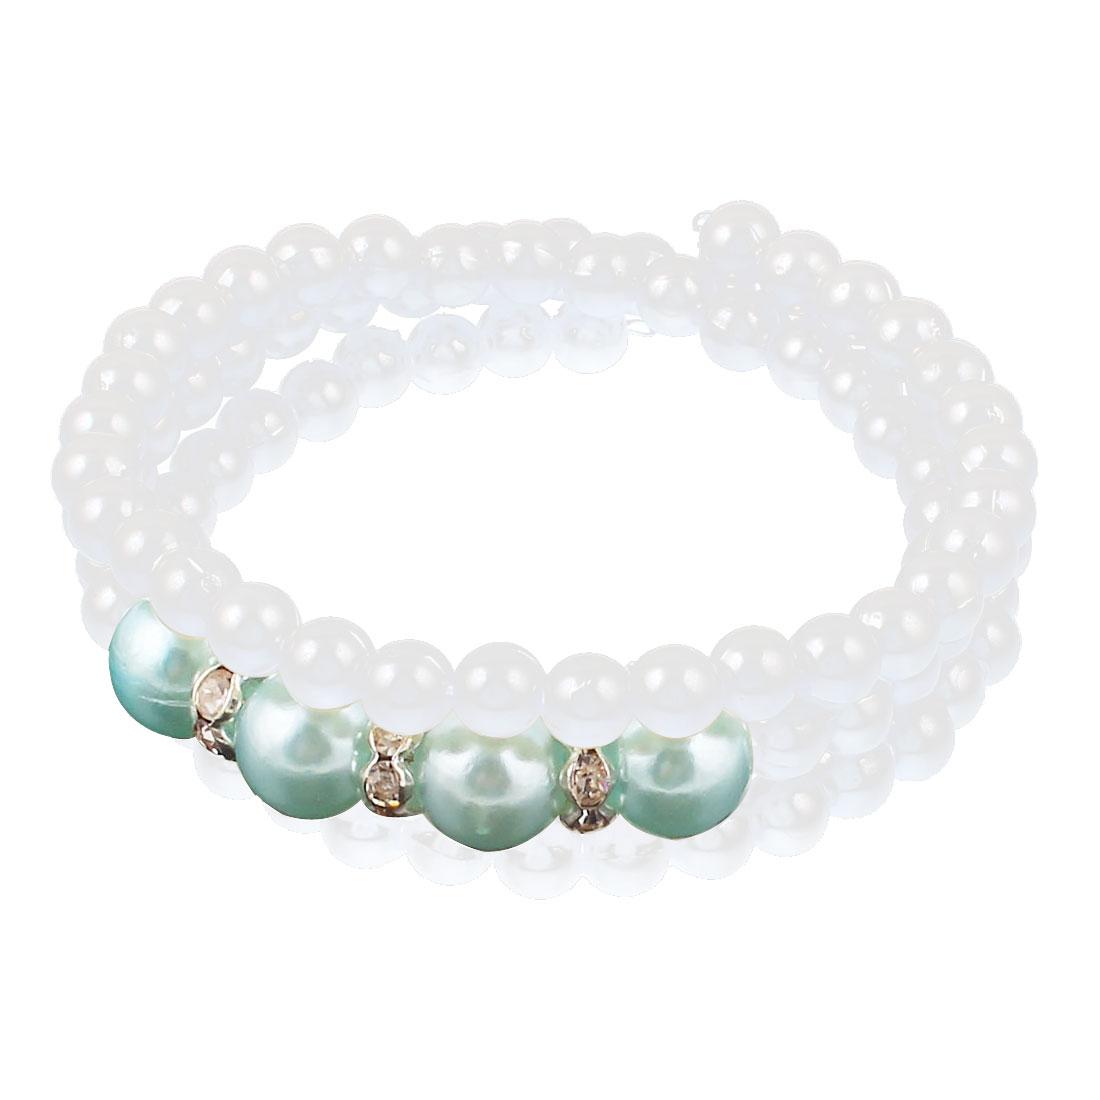 Woman White Blue Imitation Pearls Rhinestones Decor 3 Layer Spiral Elastic Wrist Chain Bracelet Bangle